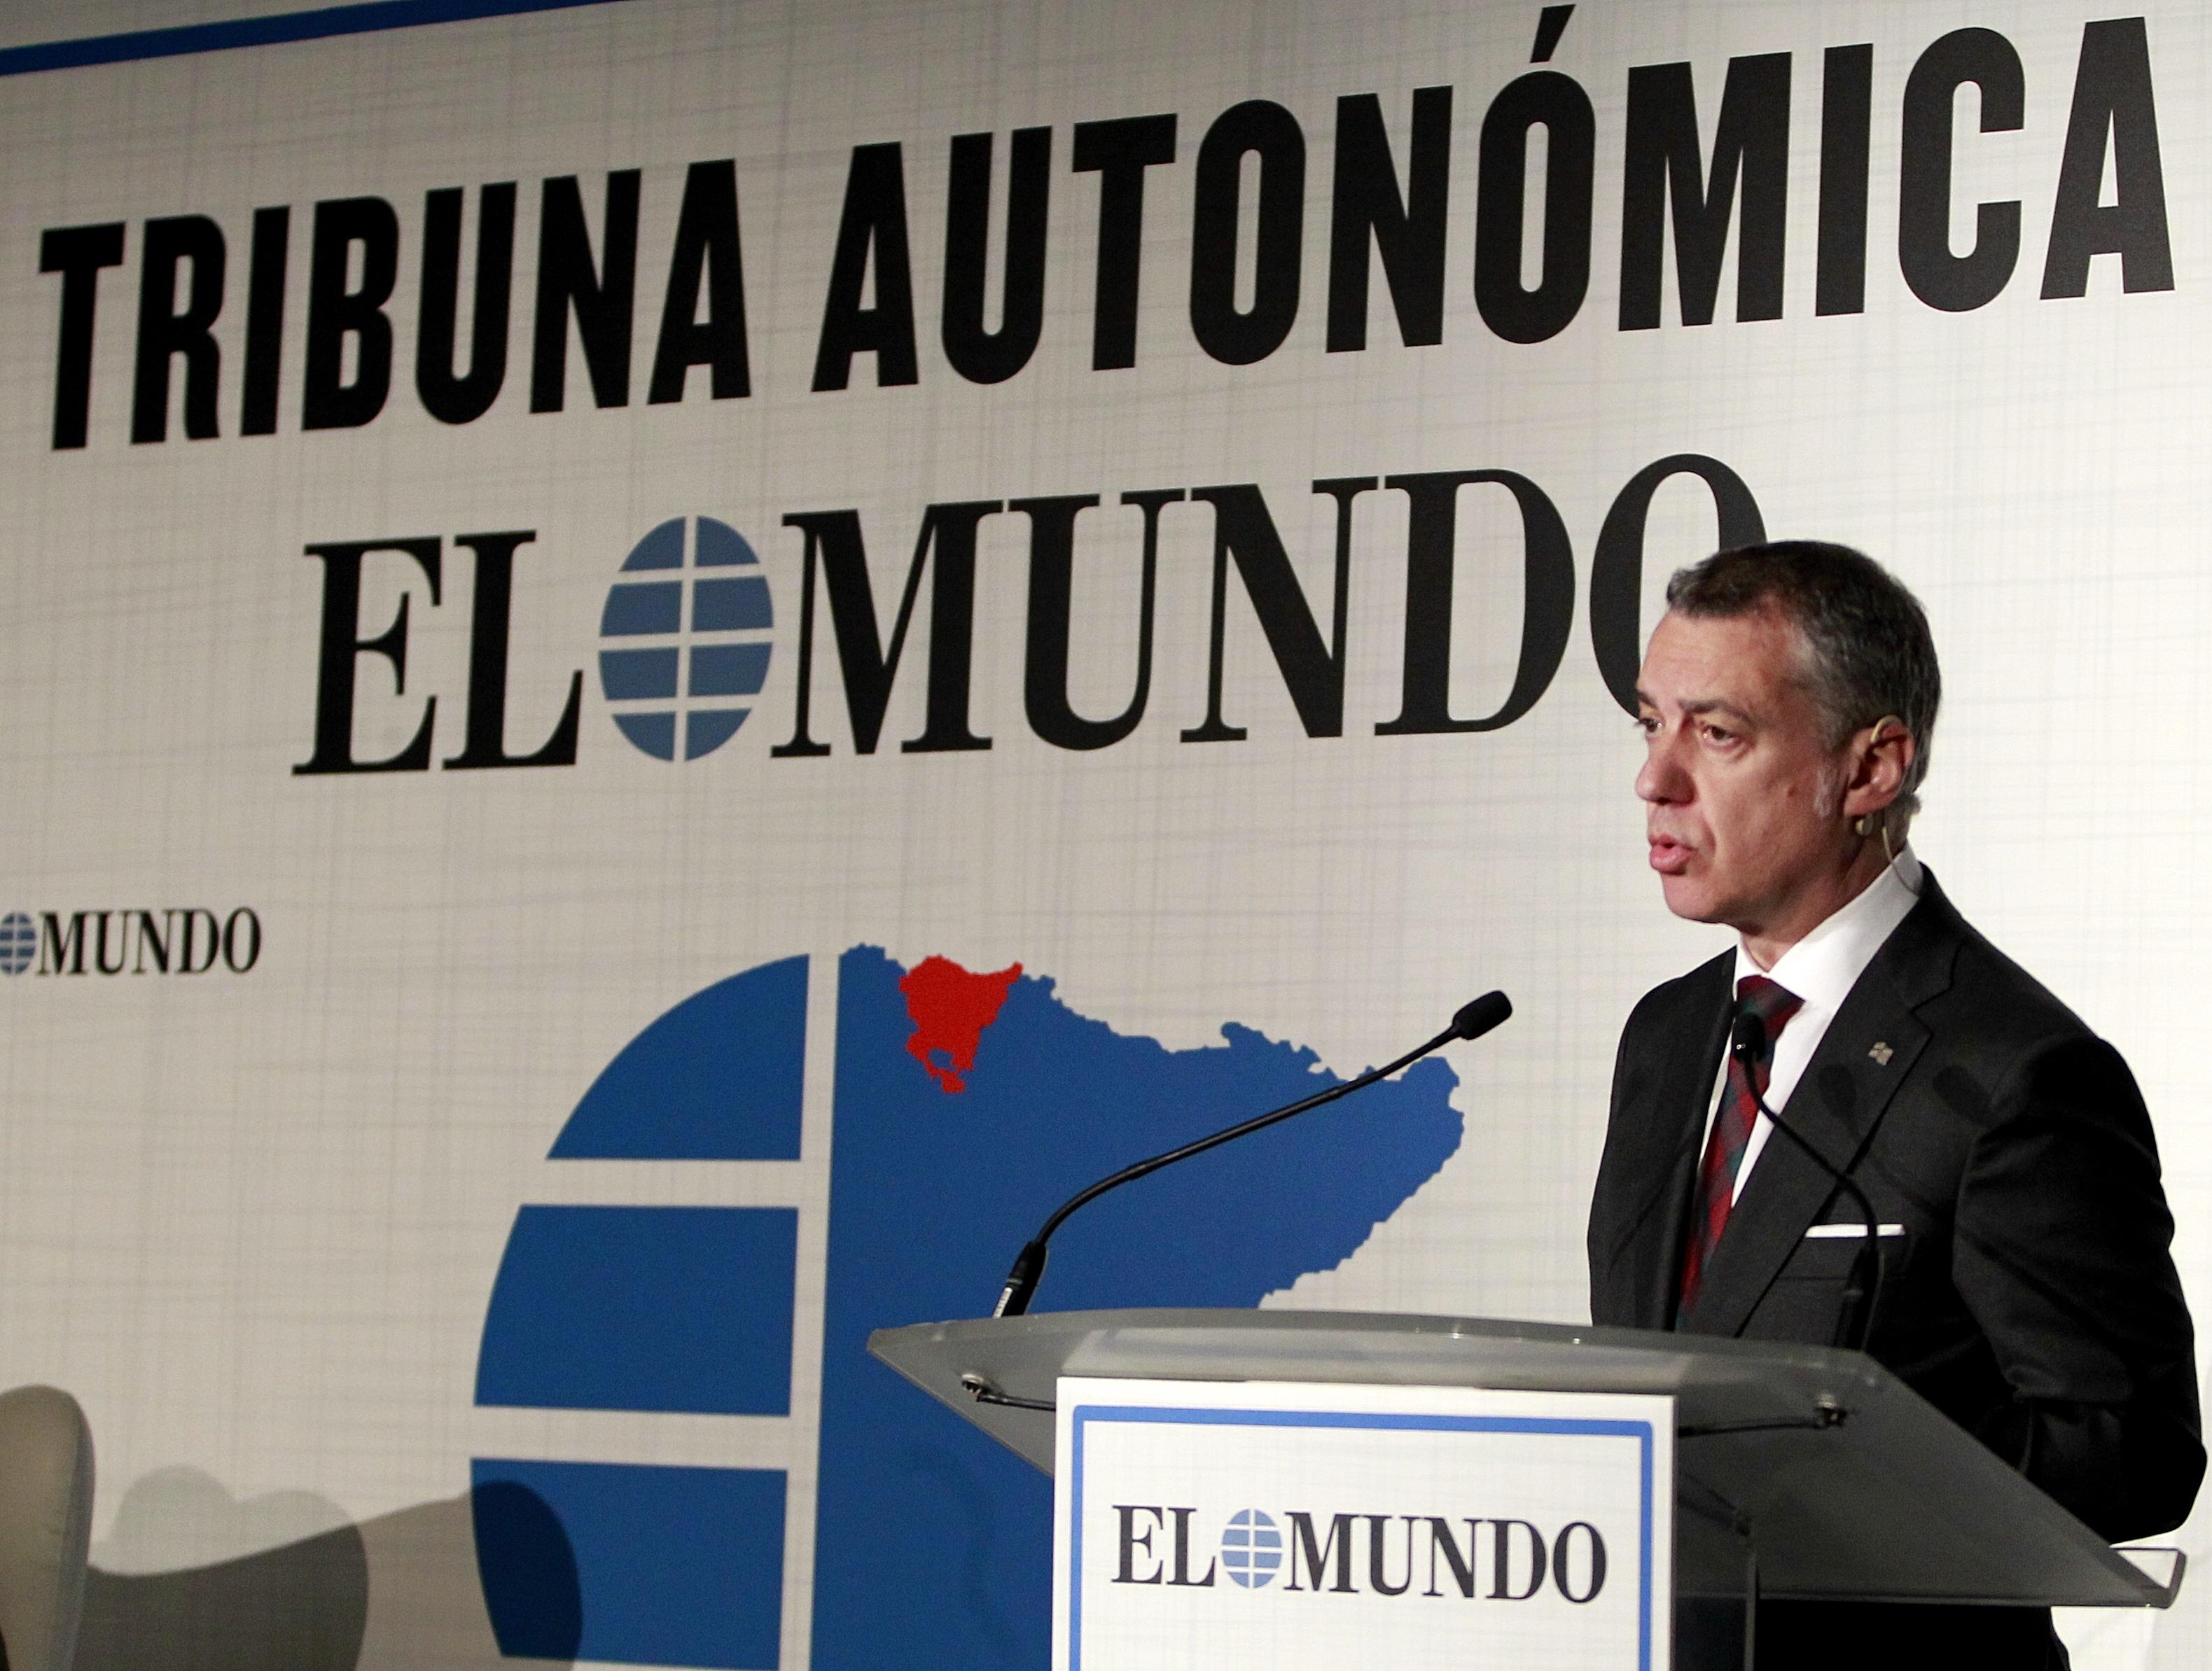 lhk_foro_unidad_editorial_01.jpg